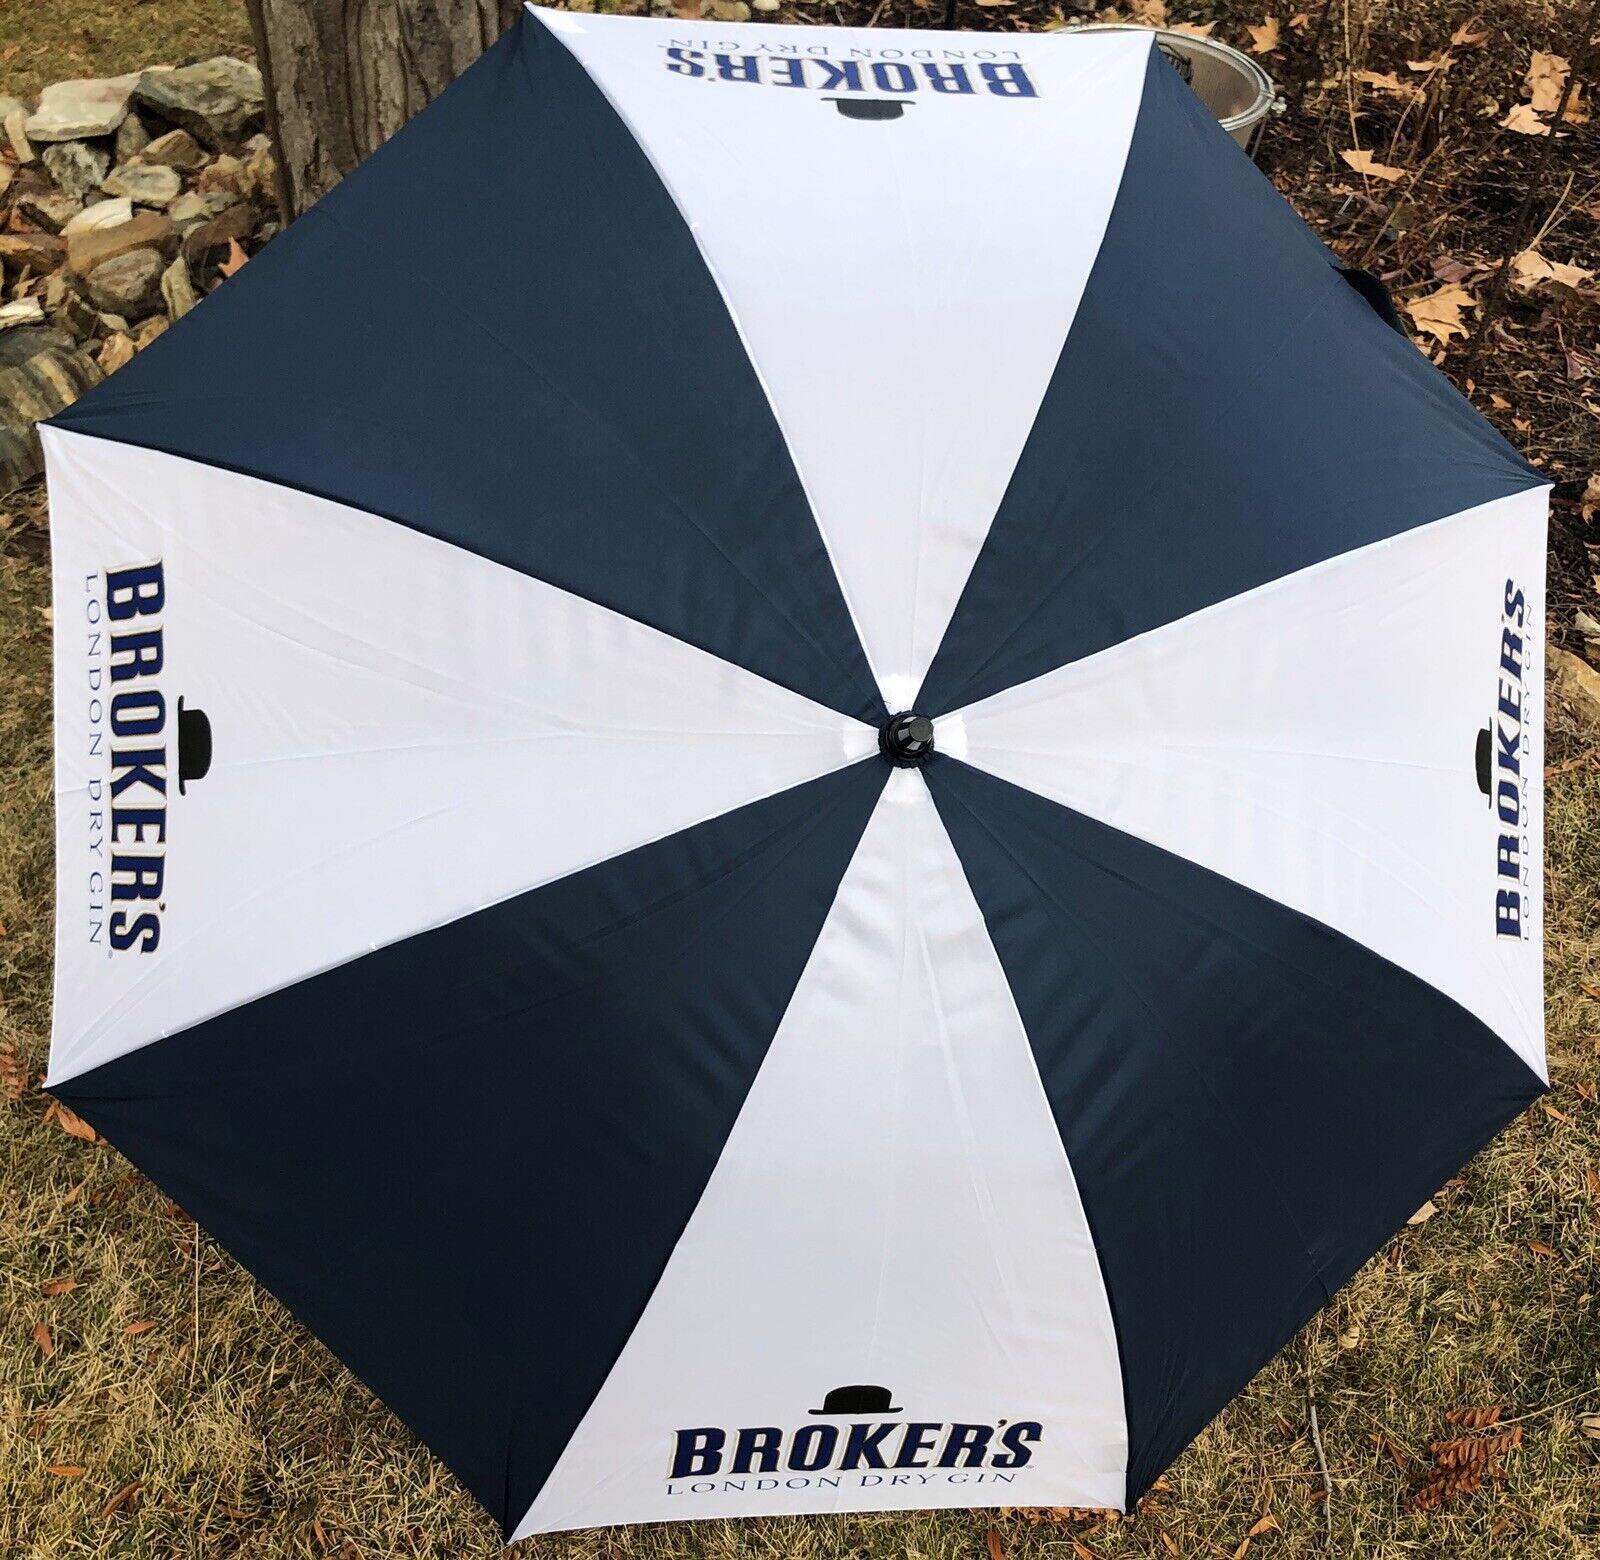 "*New* Broker's London Dry Gin Rain Essentials Manual Open 52"" Classic Umbrella"